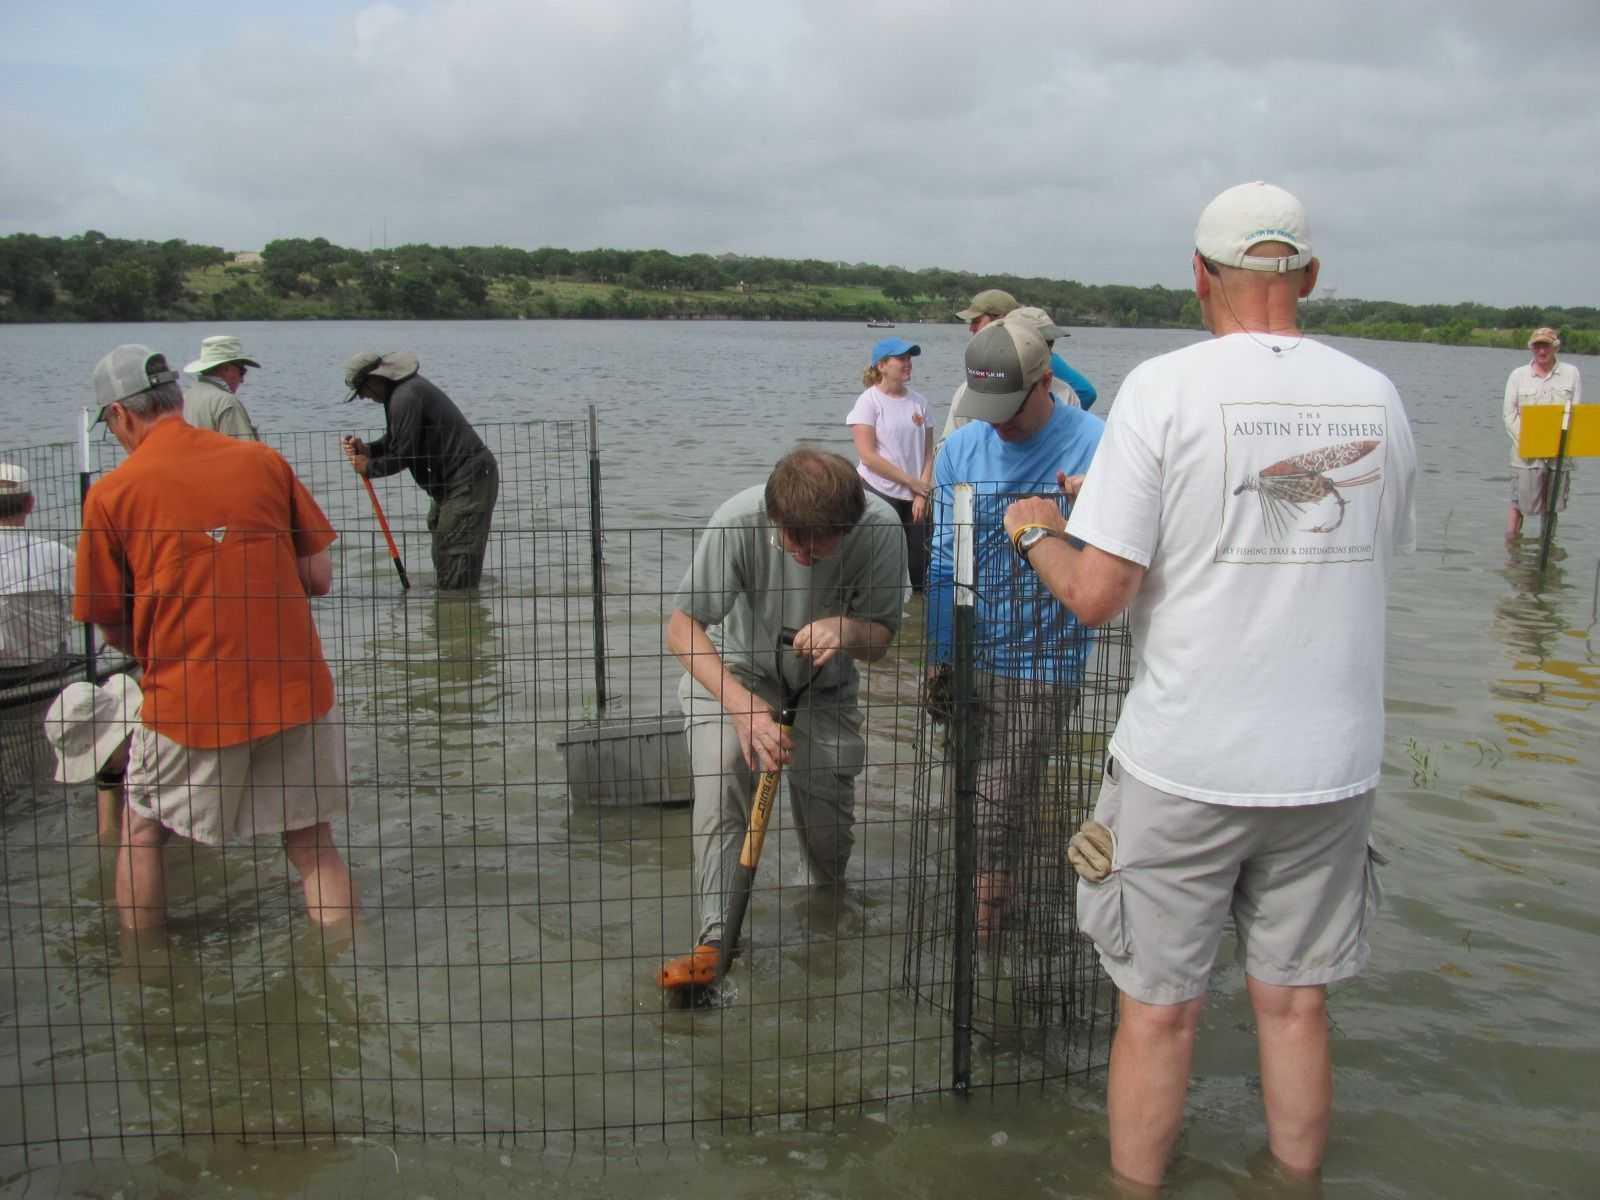 Austin fly fishers improving local fishing coastal for Fly fishing austin texas